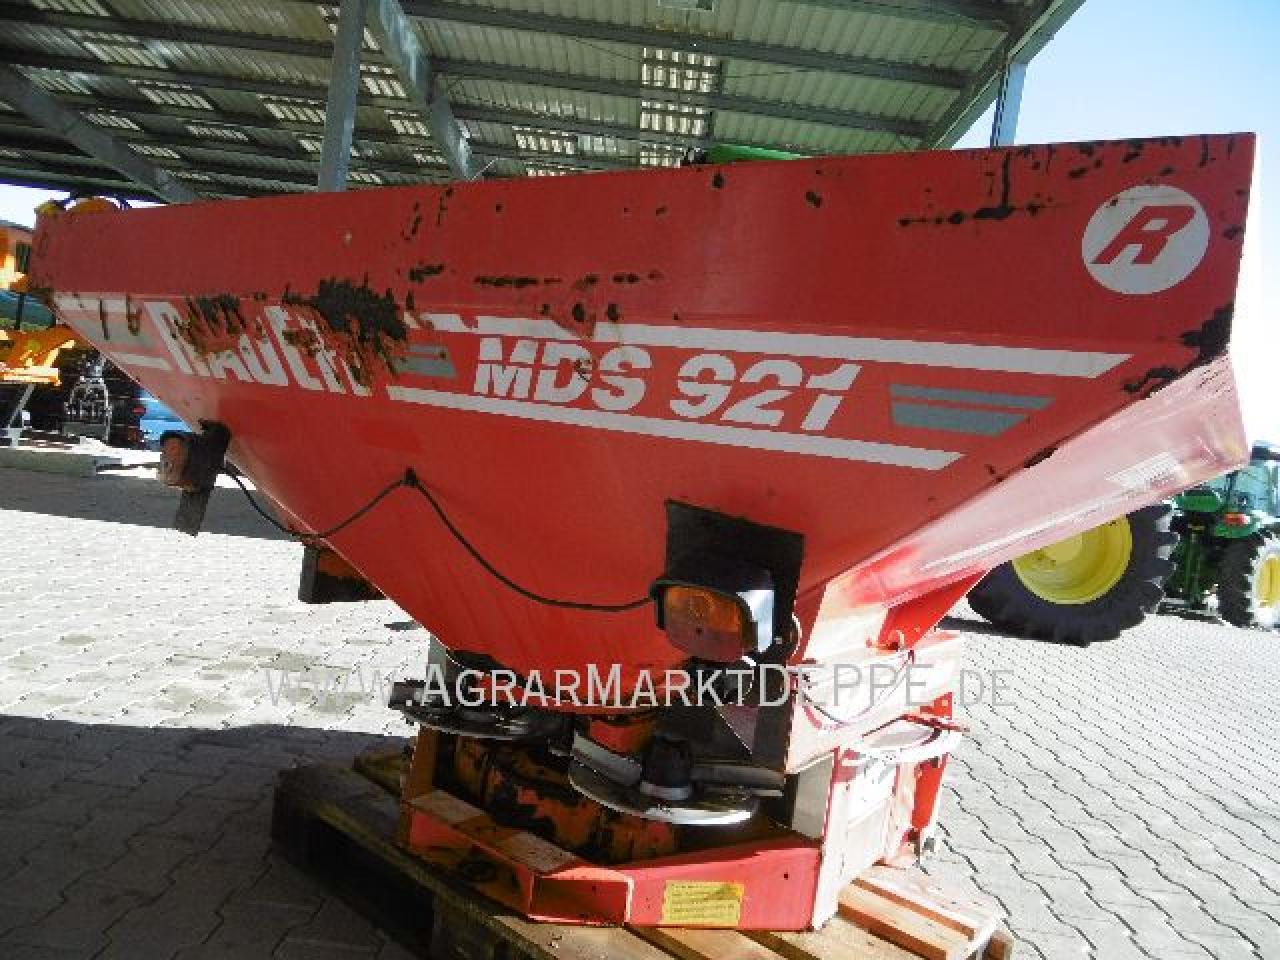 Rauch MDS 921